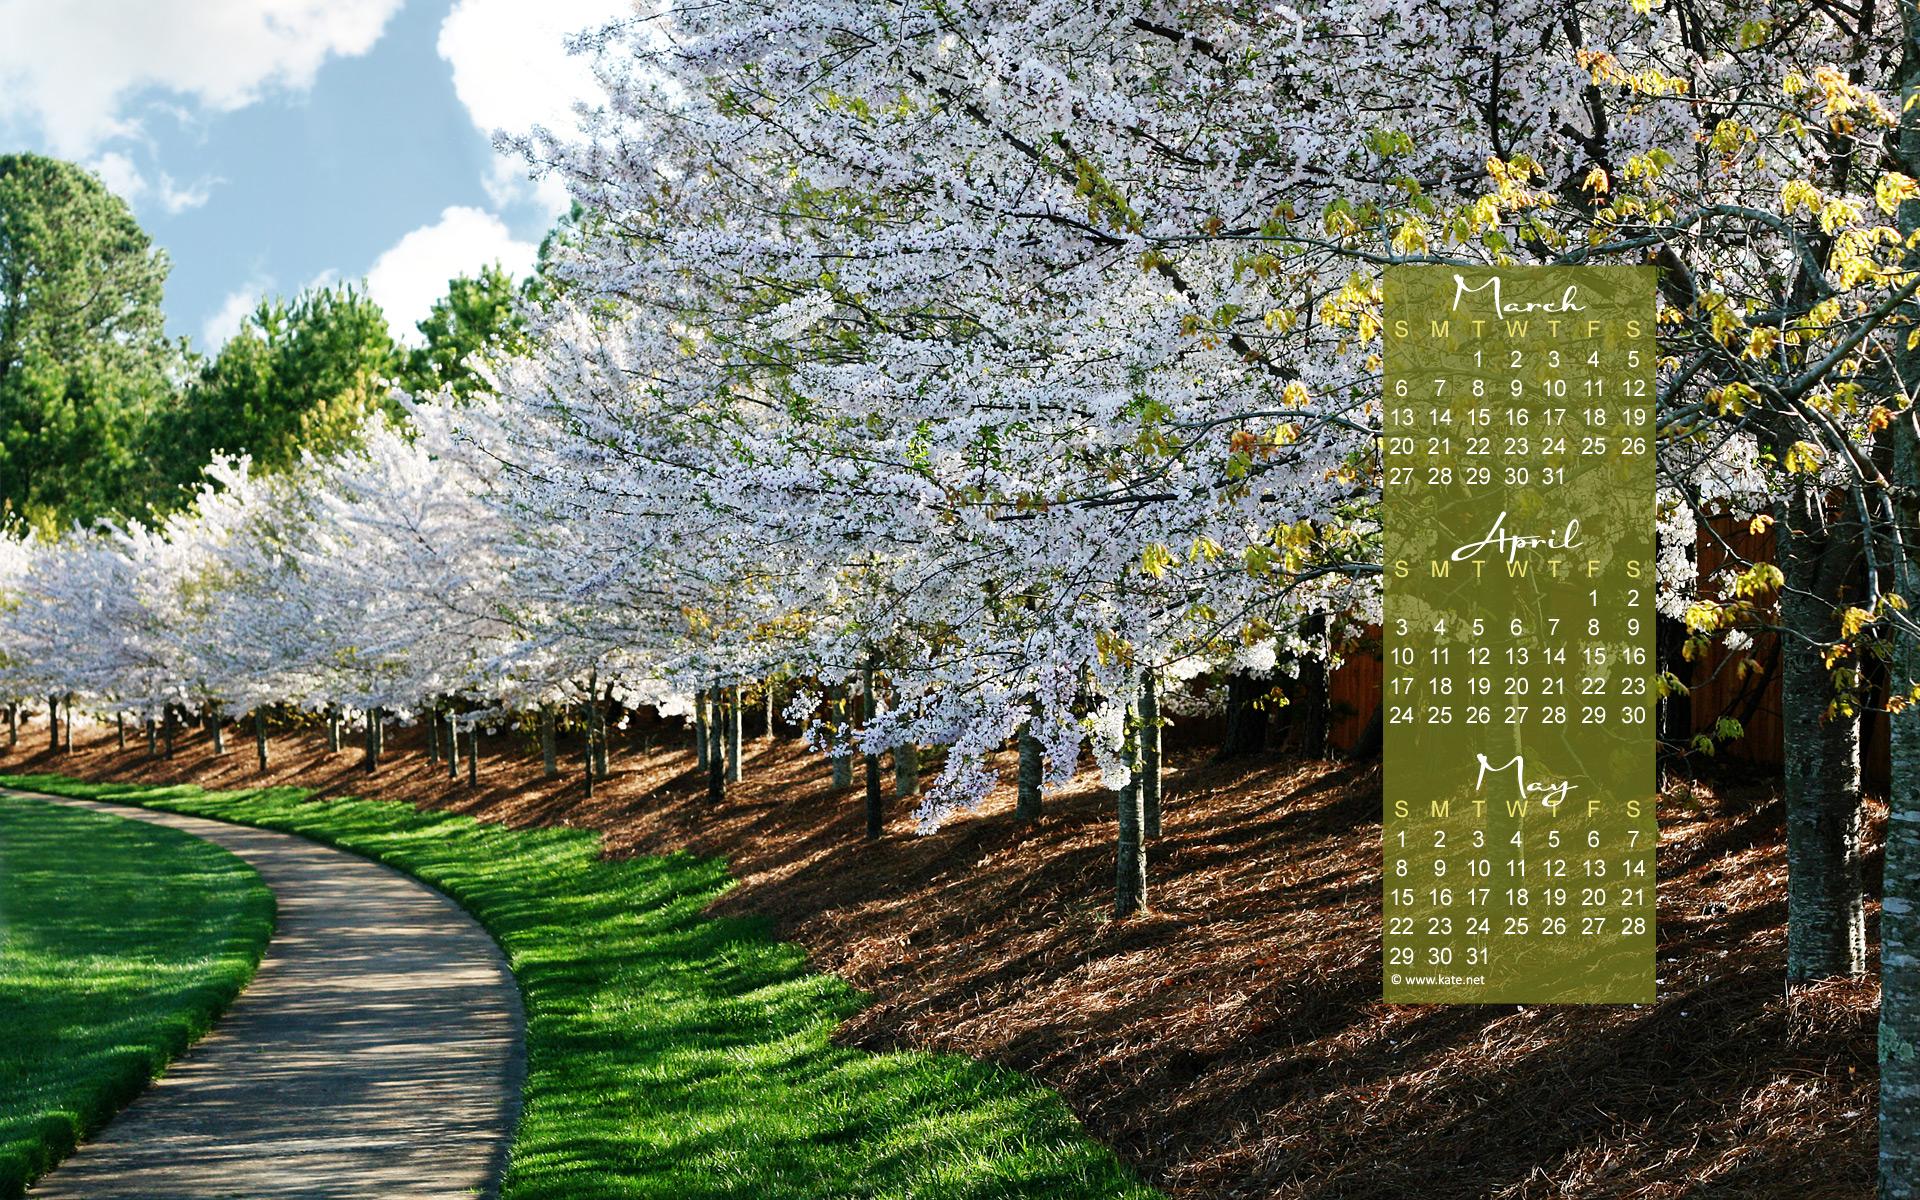 Free 2012 calendar screensaver in Title/Summary